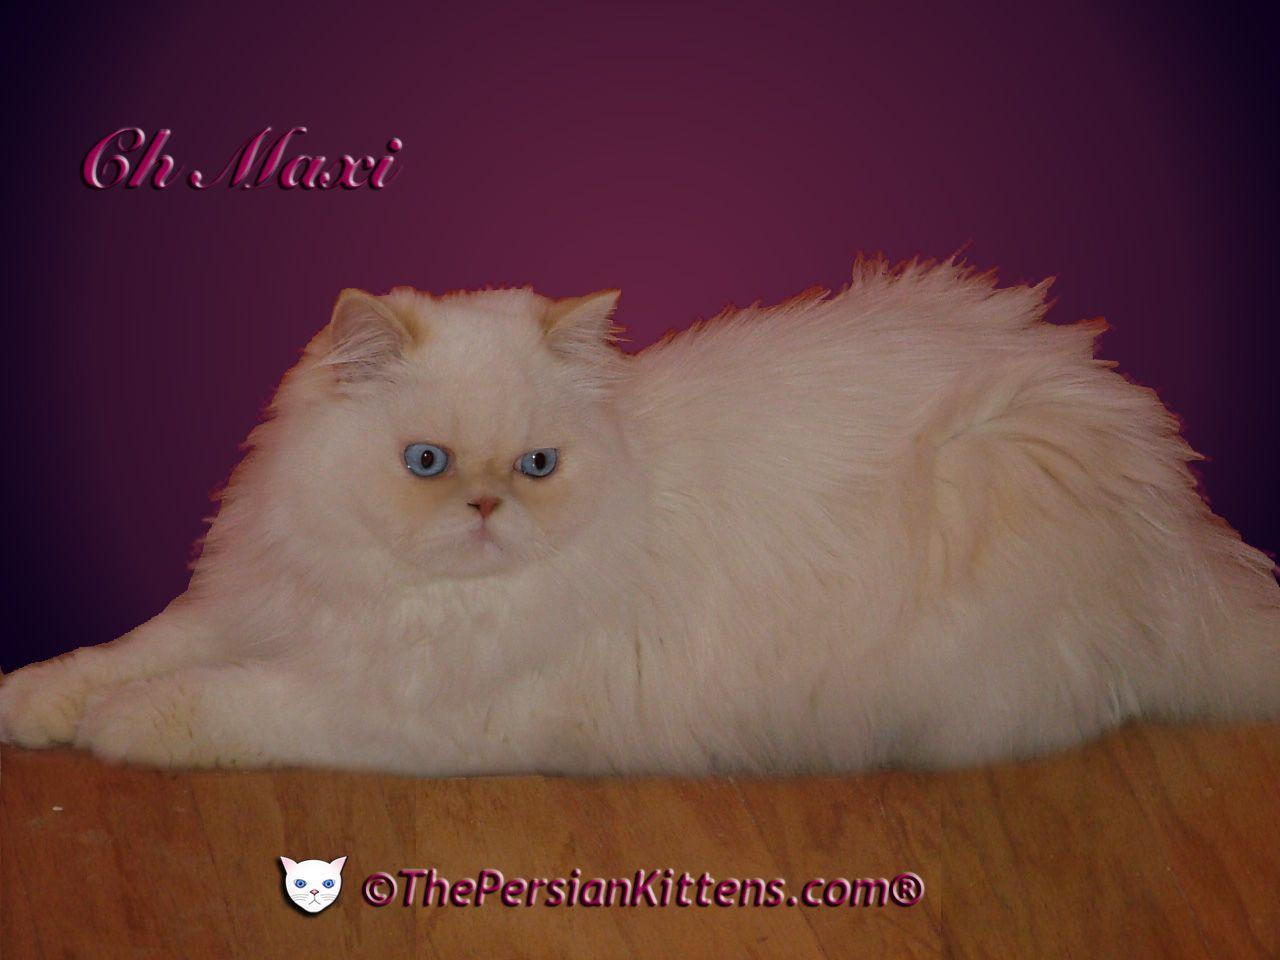 Persian Kitten Maxi Jpg 1280 960 Himalayan Kitten Himalayan Kittens For Sale Kitten For Sale